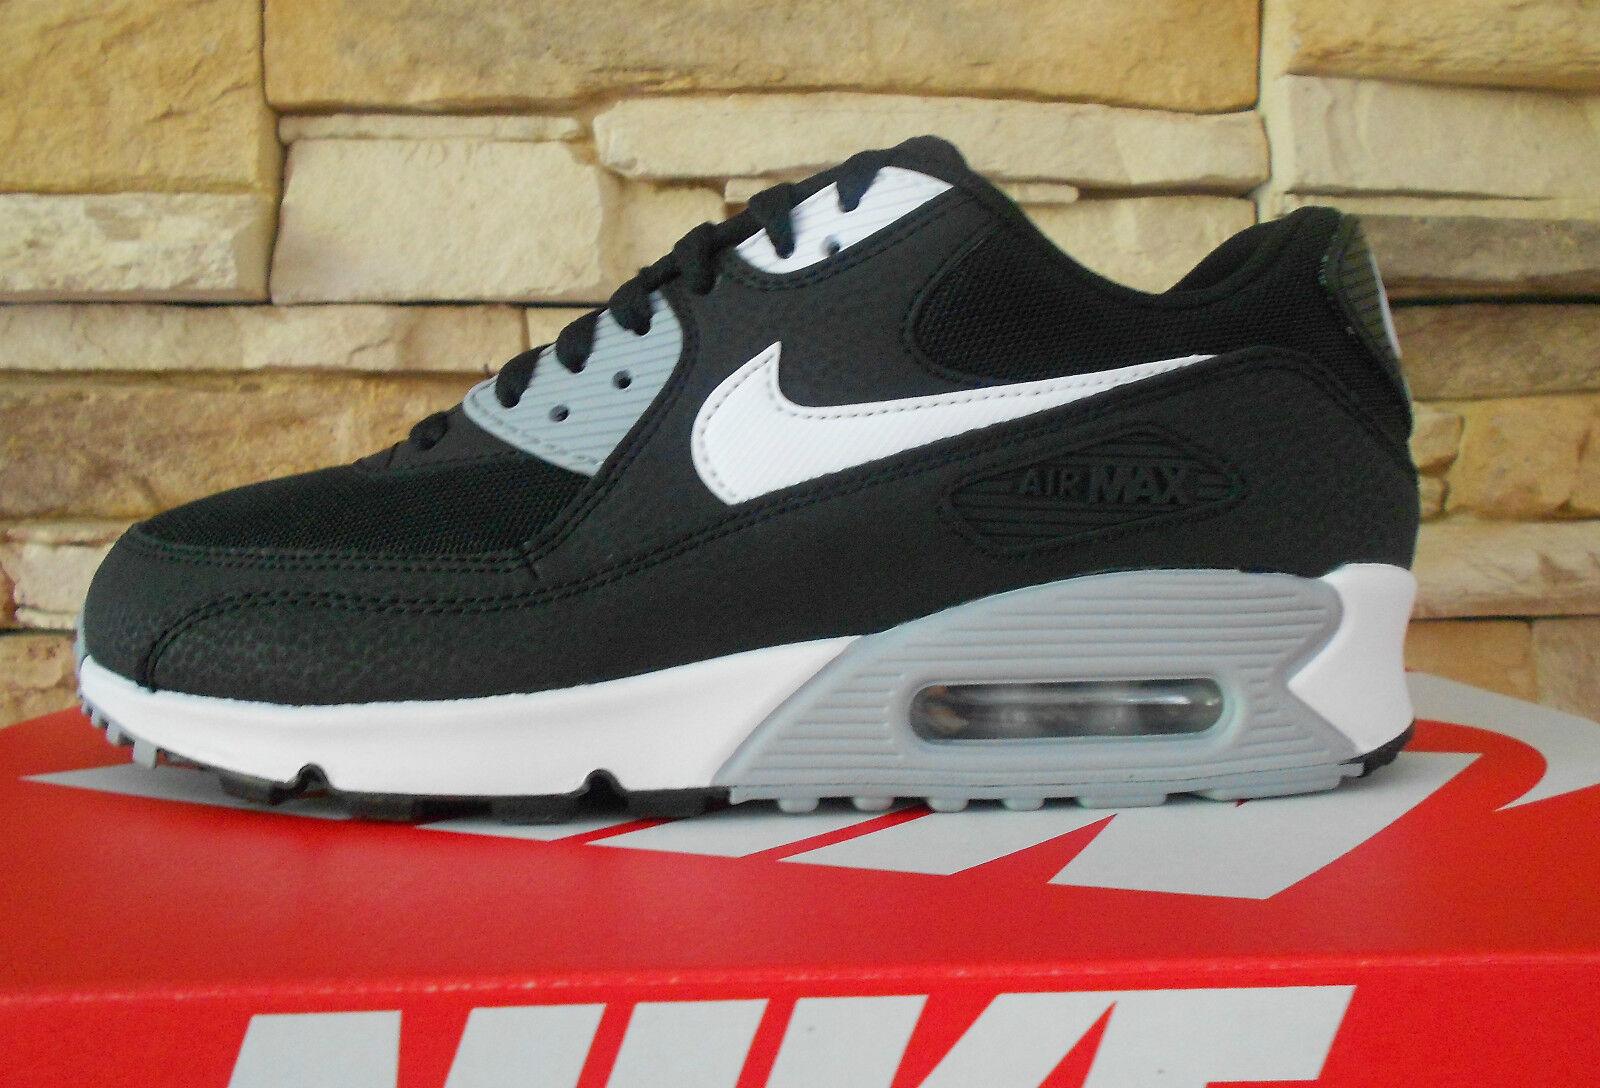 Nike Air max 90 Essential Damen Mesh schwarz/weiß/grau Gr. 39 (US 8) 616730012